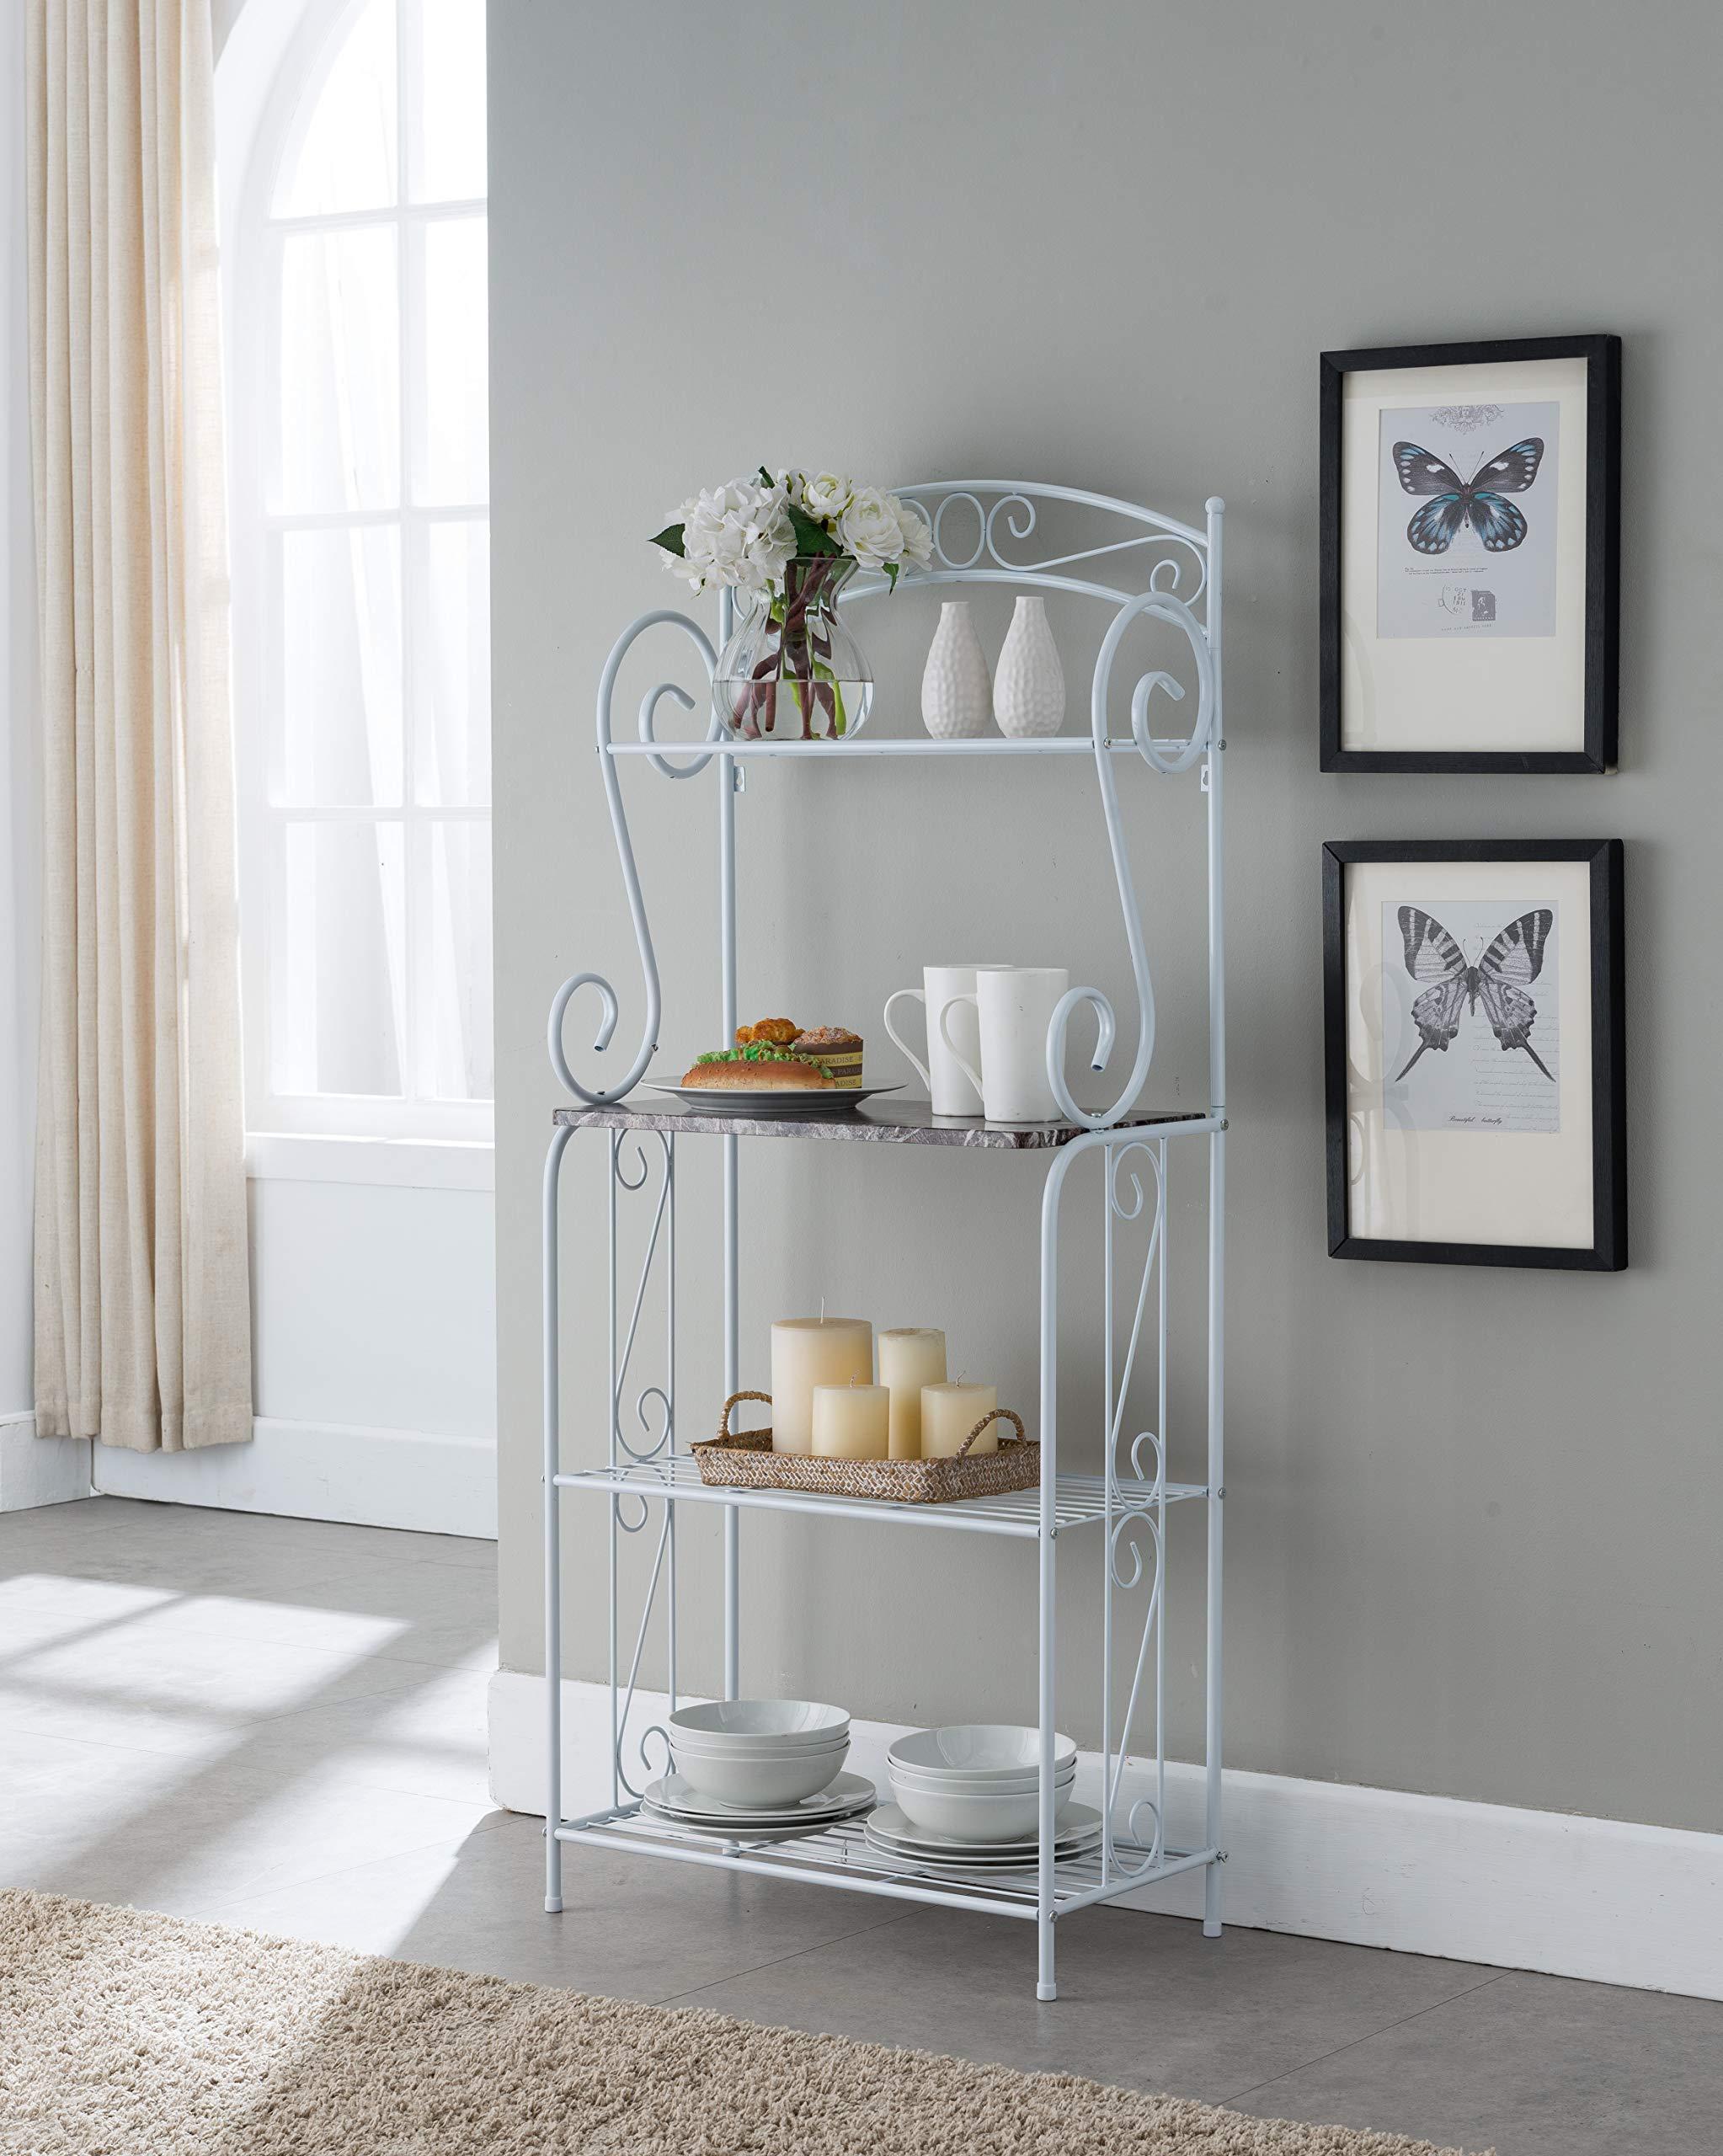 Kings Brand Furniture - Bulberry Metal Kitchen Storage Baker's Rack, White